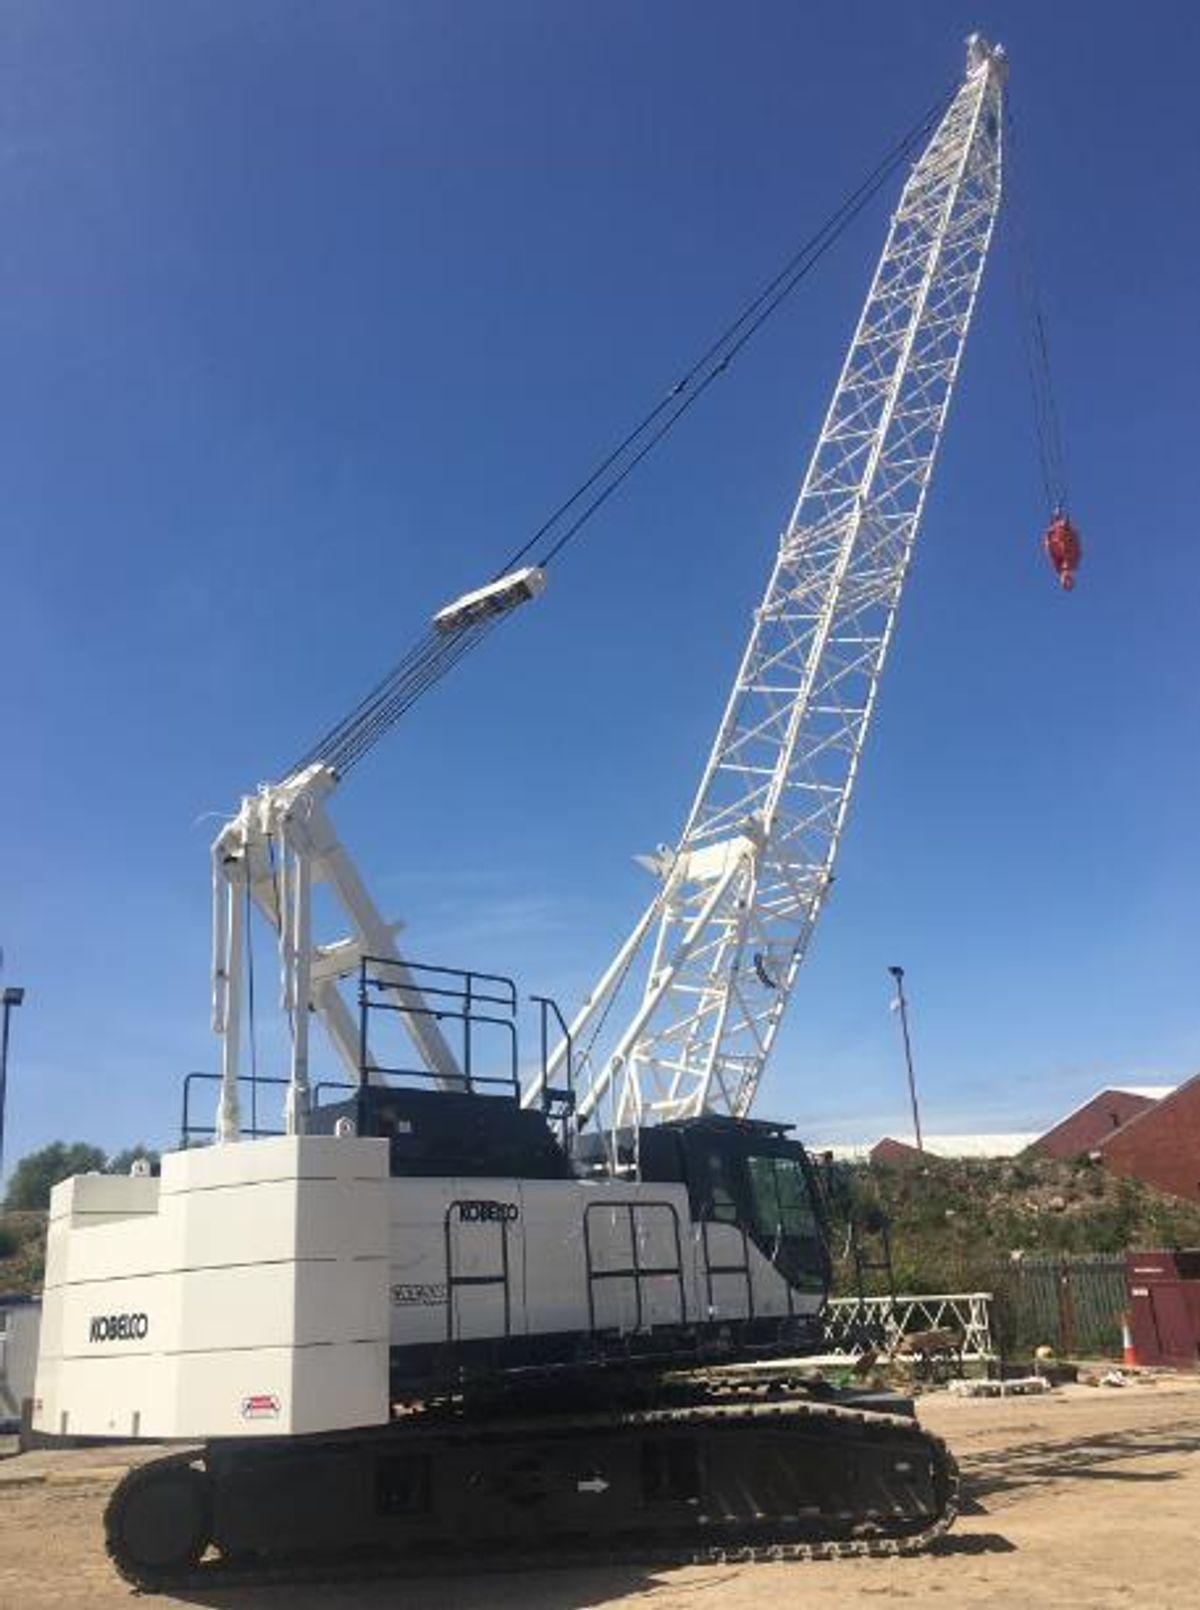 Kobelco Crawler Deployed On Dublin 2 Development